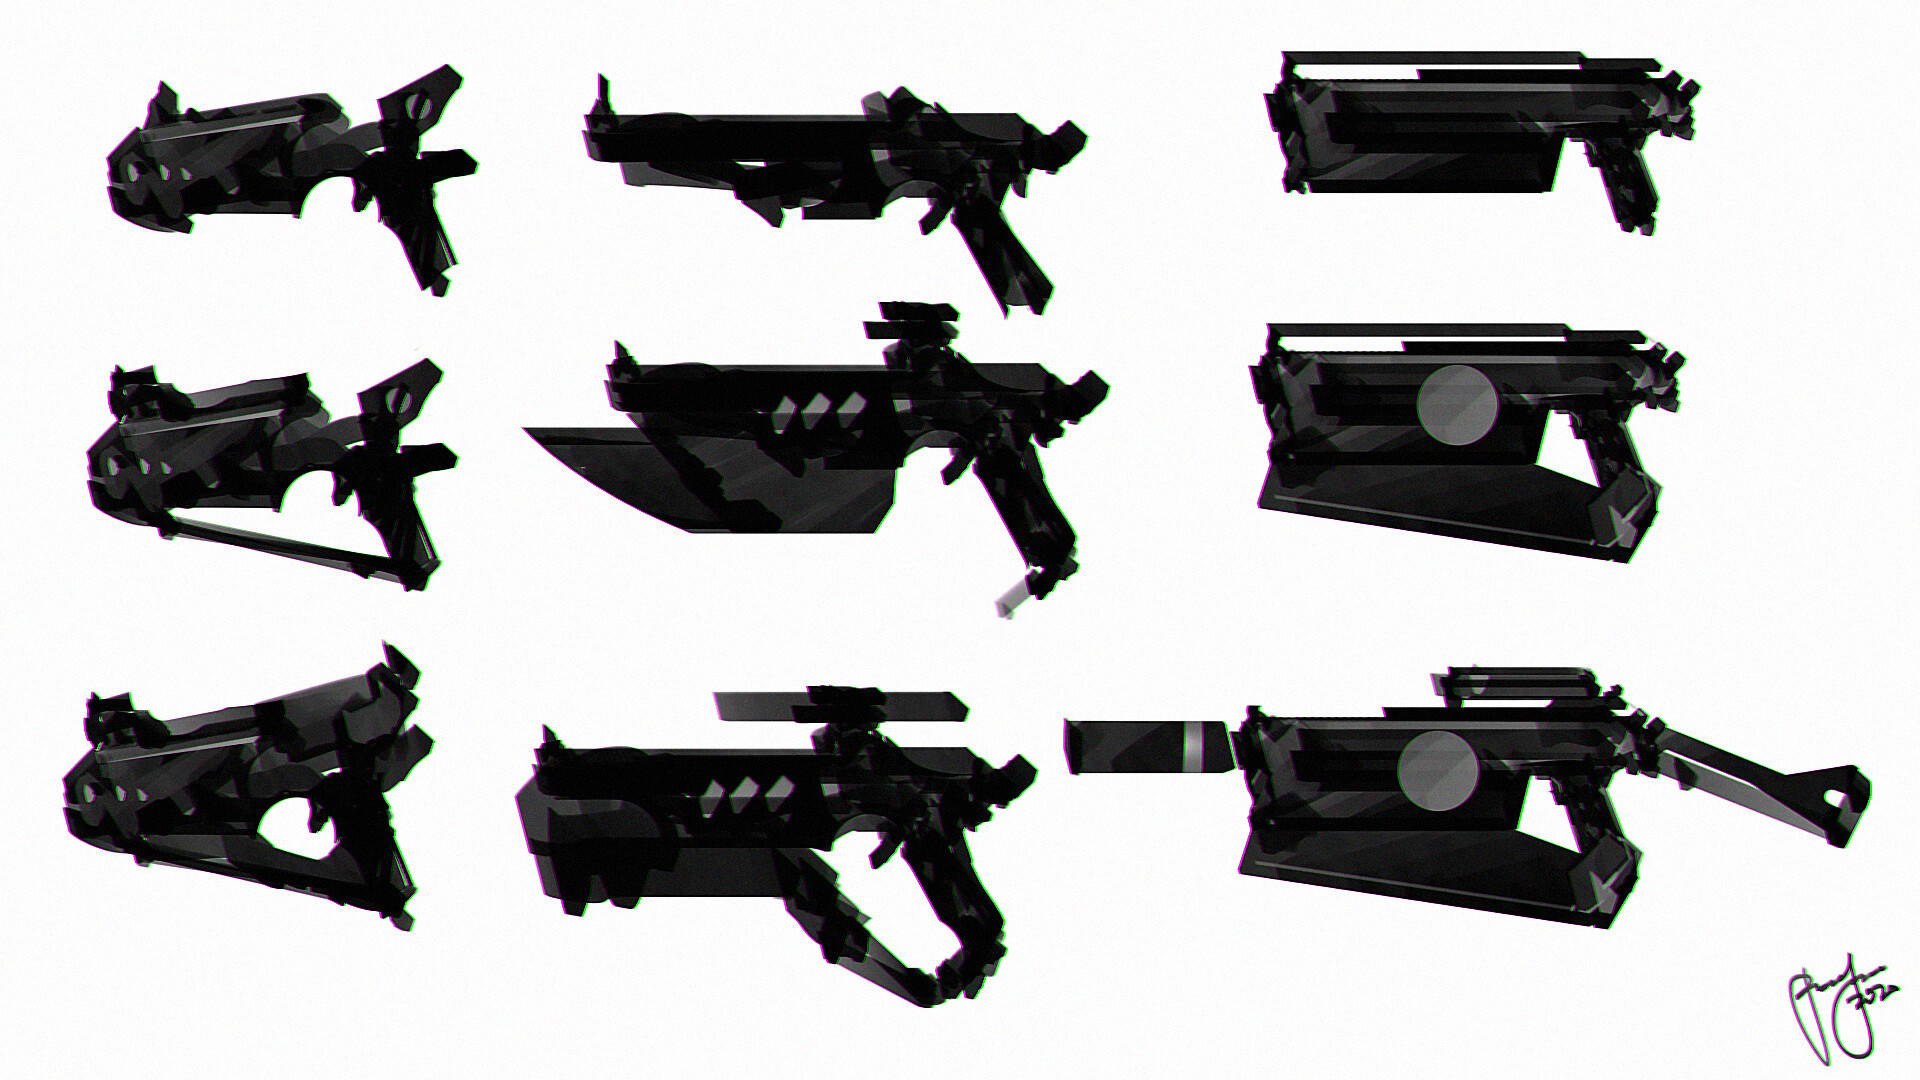 weapon designs -guns